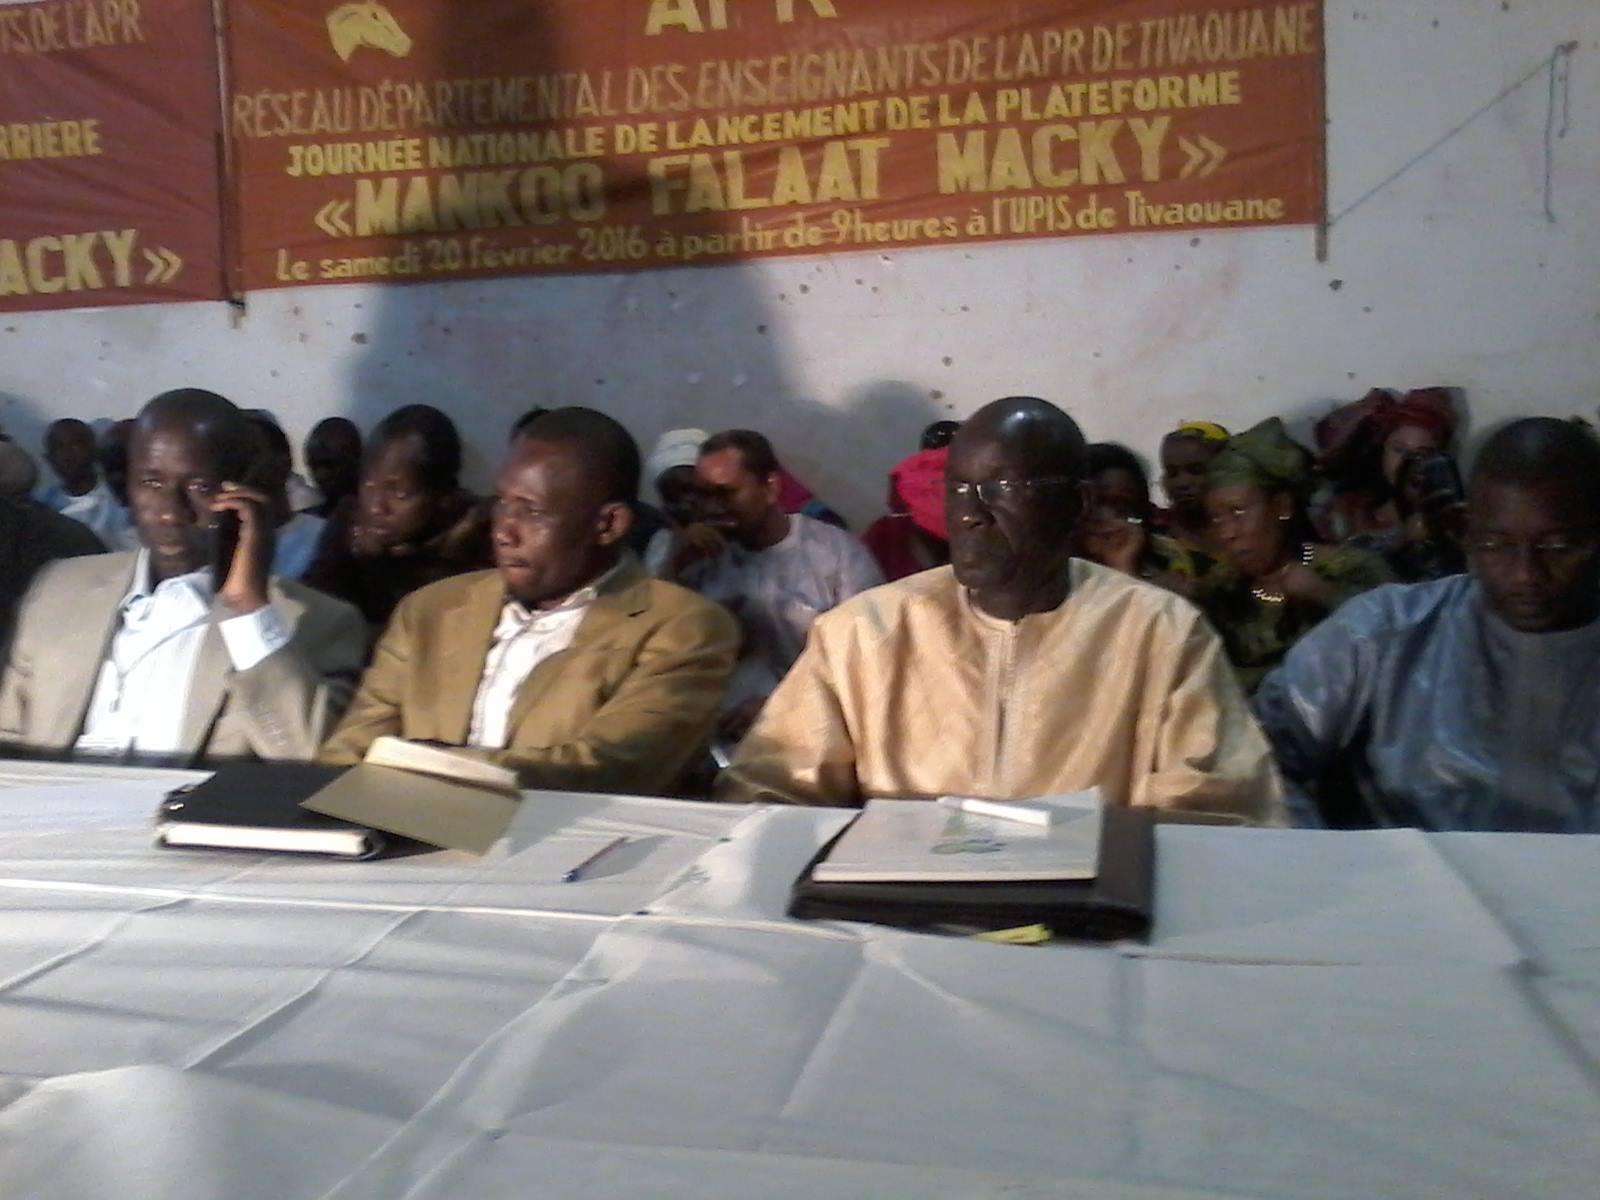 Serigne Mboup à la  Plateforme Mankoo Falaat Macky